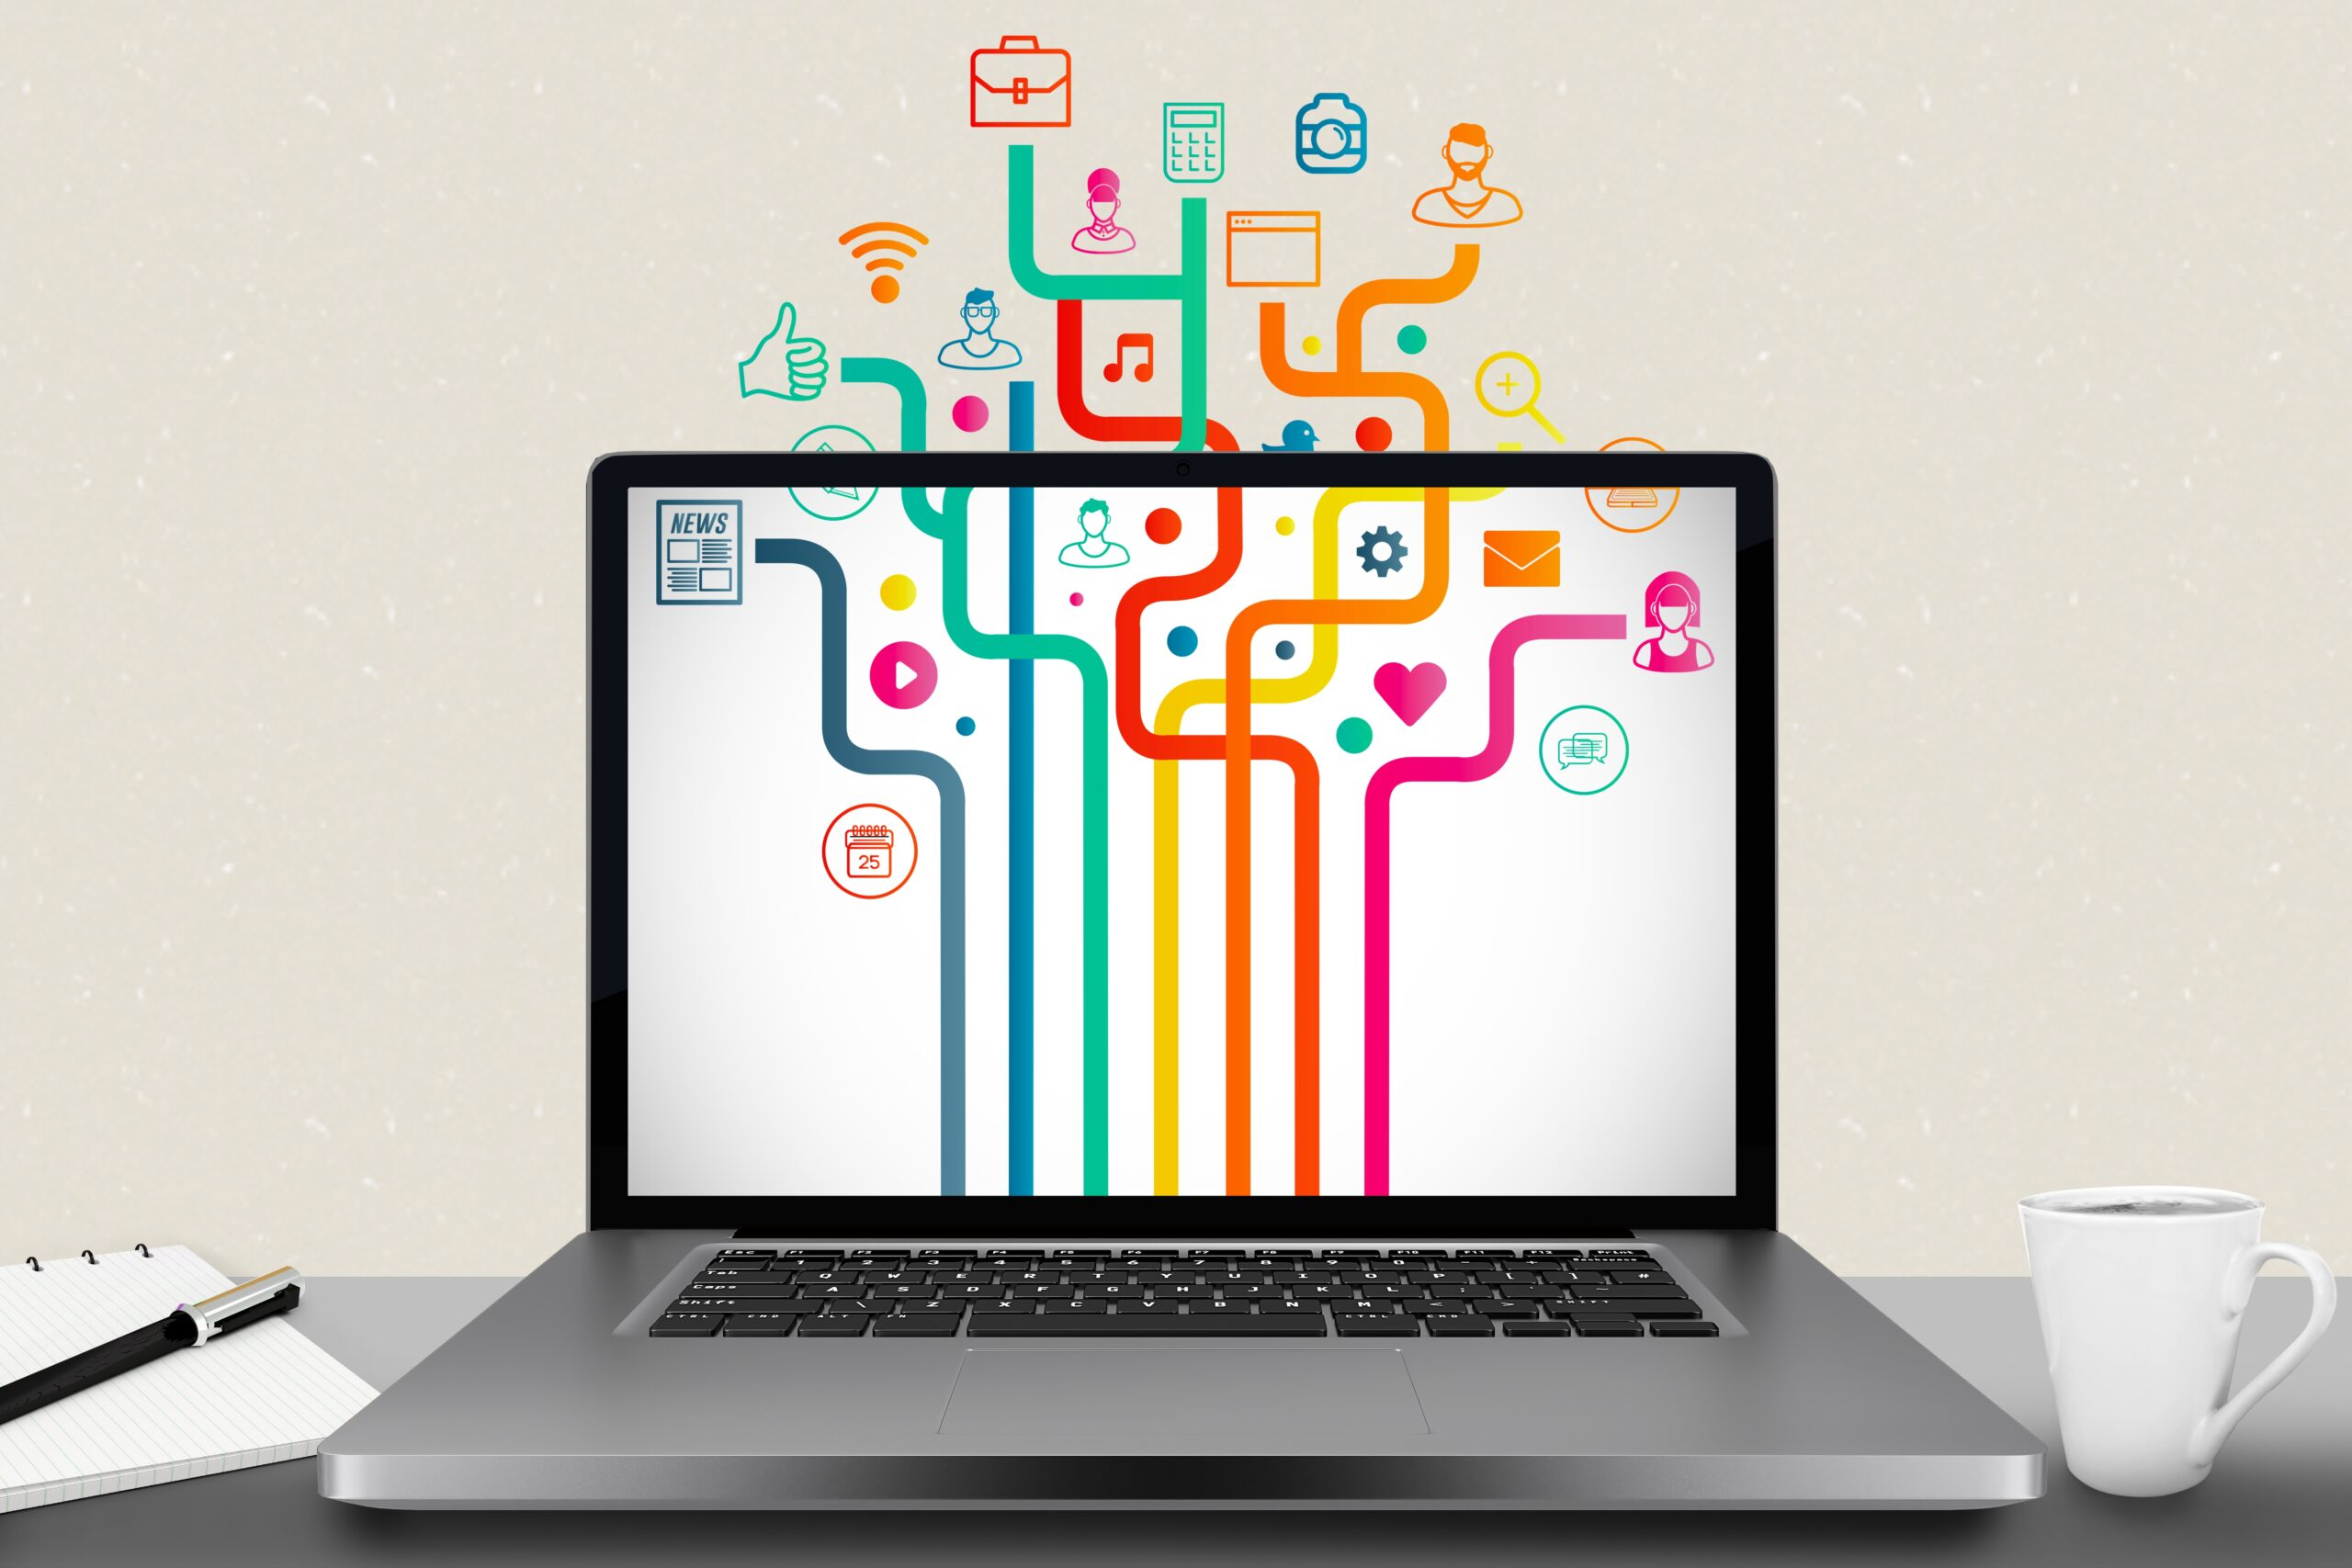 Почему Вашему офлайн-бизнесу необходим онлайн-маркетинг?